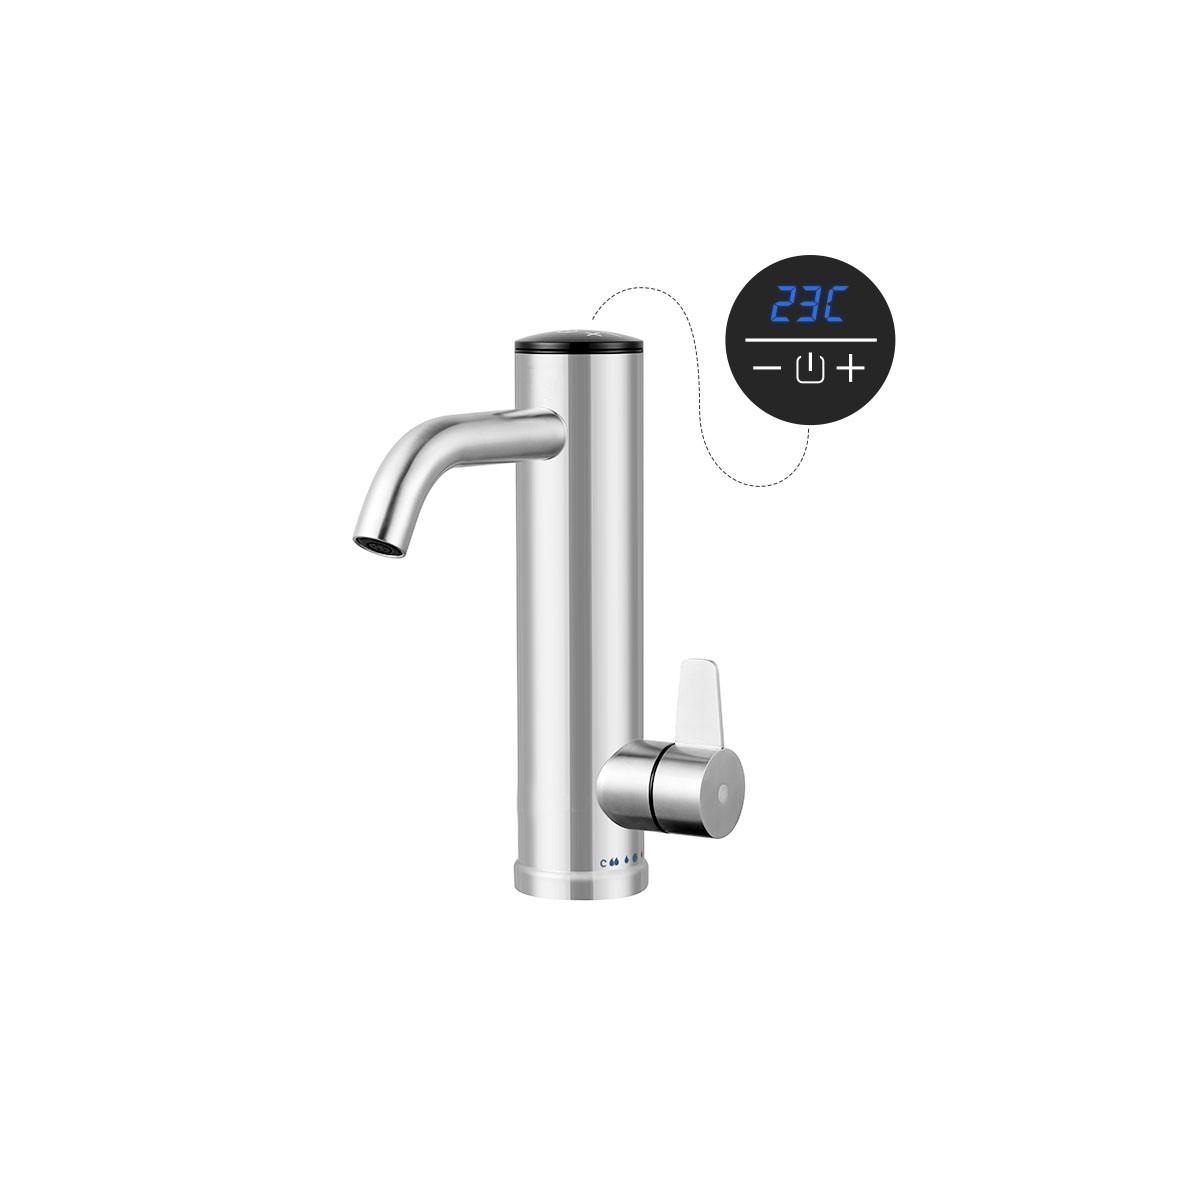 robinet-chauffe-eau-TE33H-BSF